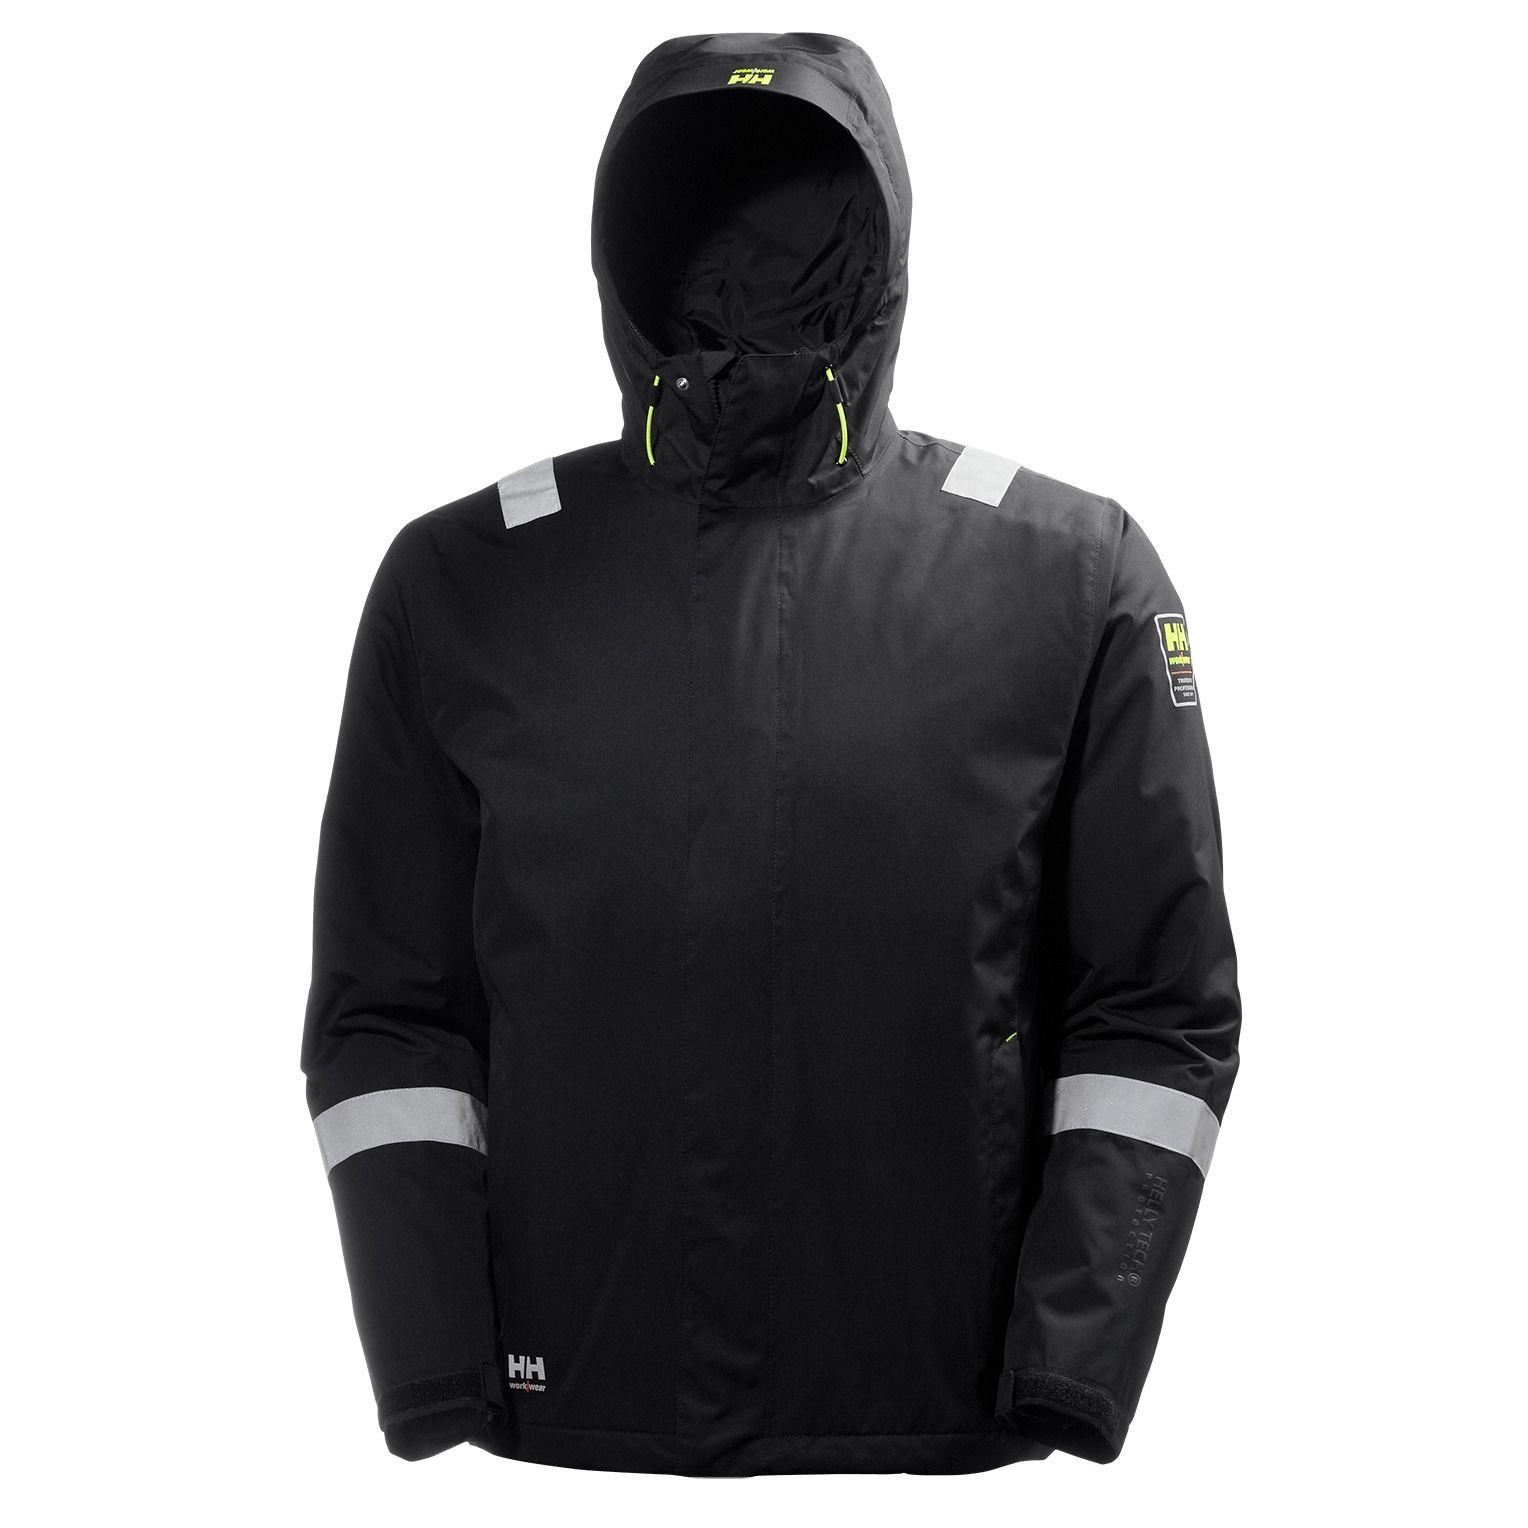 Куртка Helly Hansen Aker Winterjacket - 71351 (Black; L)